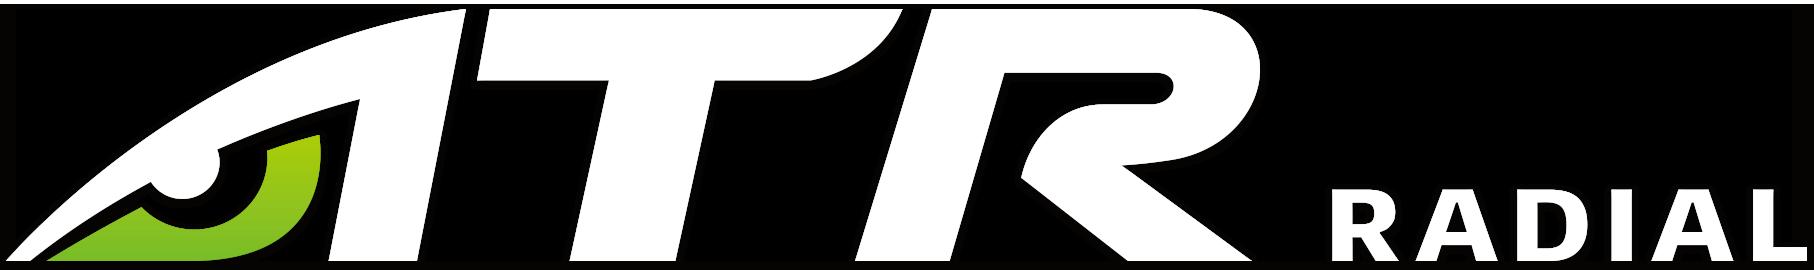 atrradial_logo